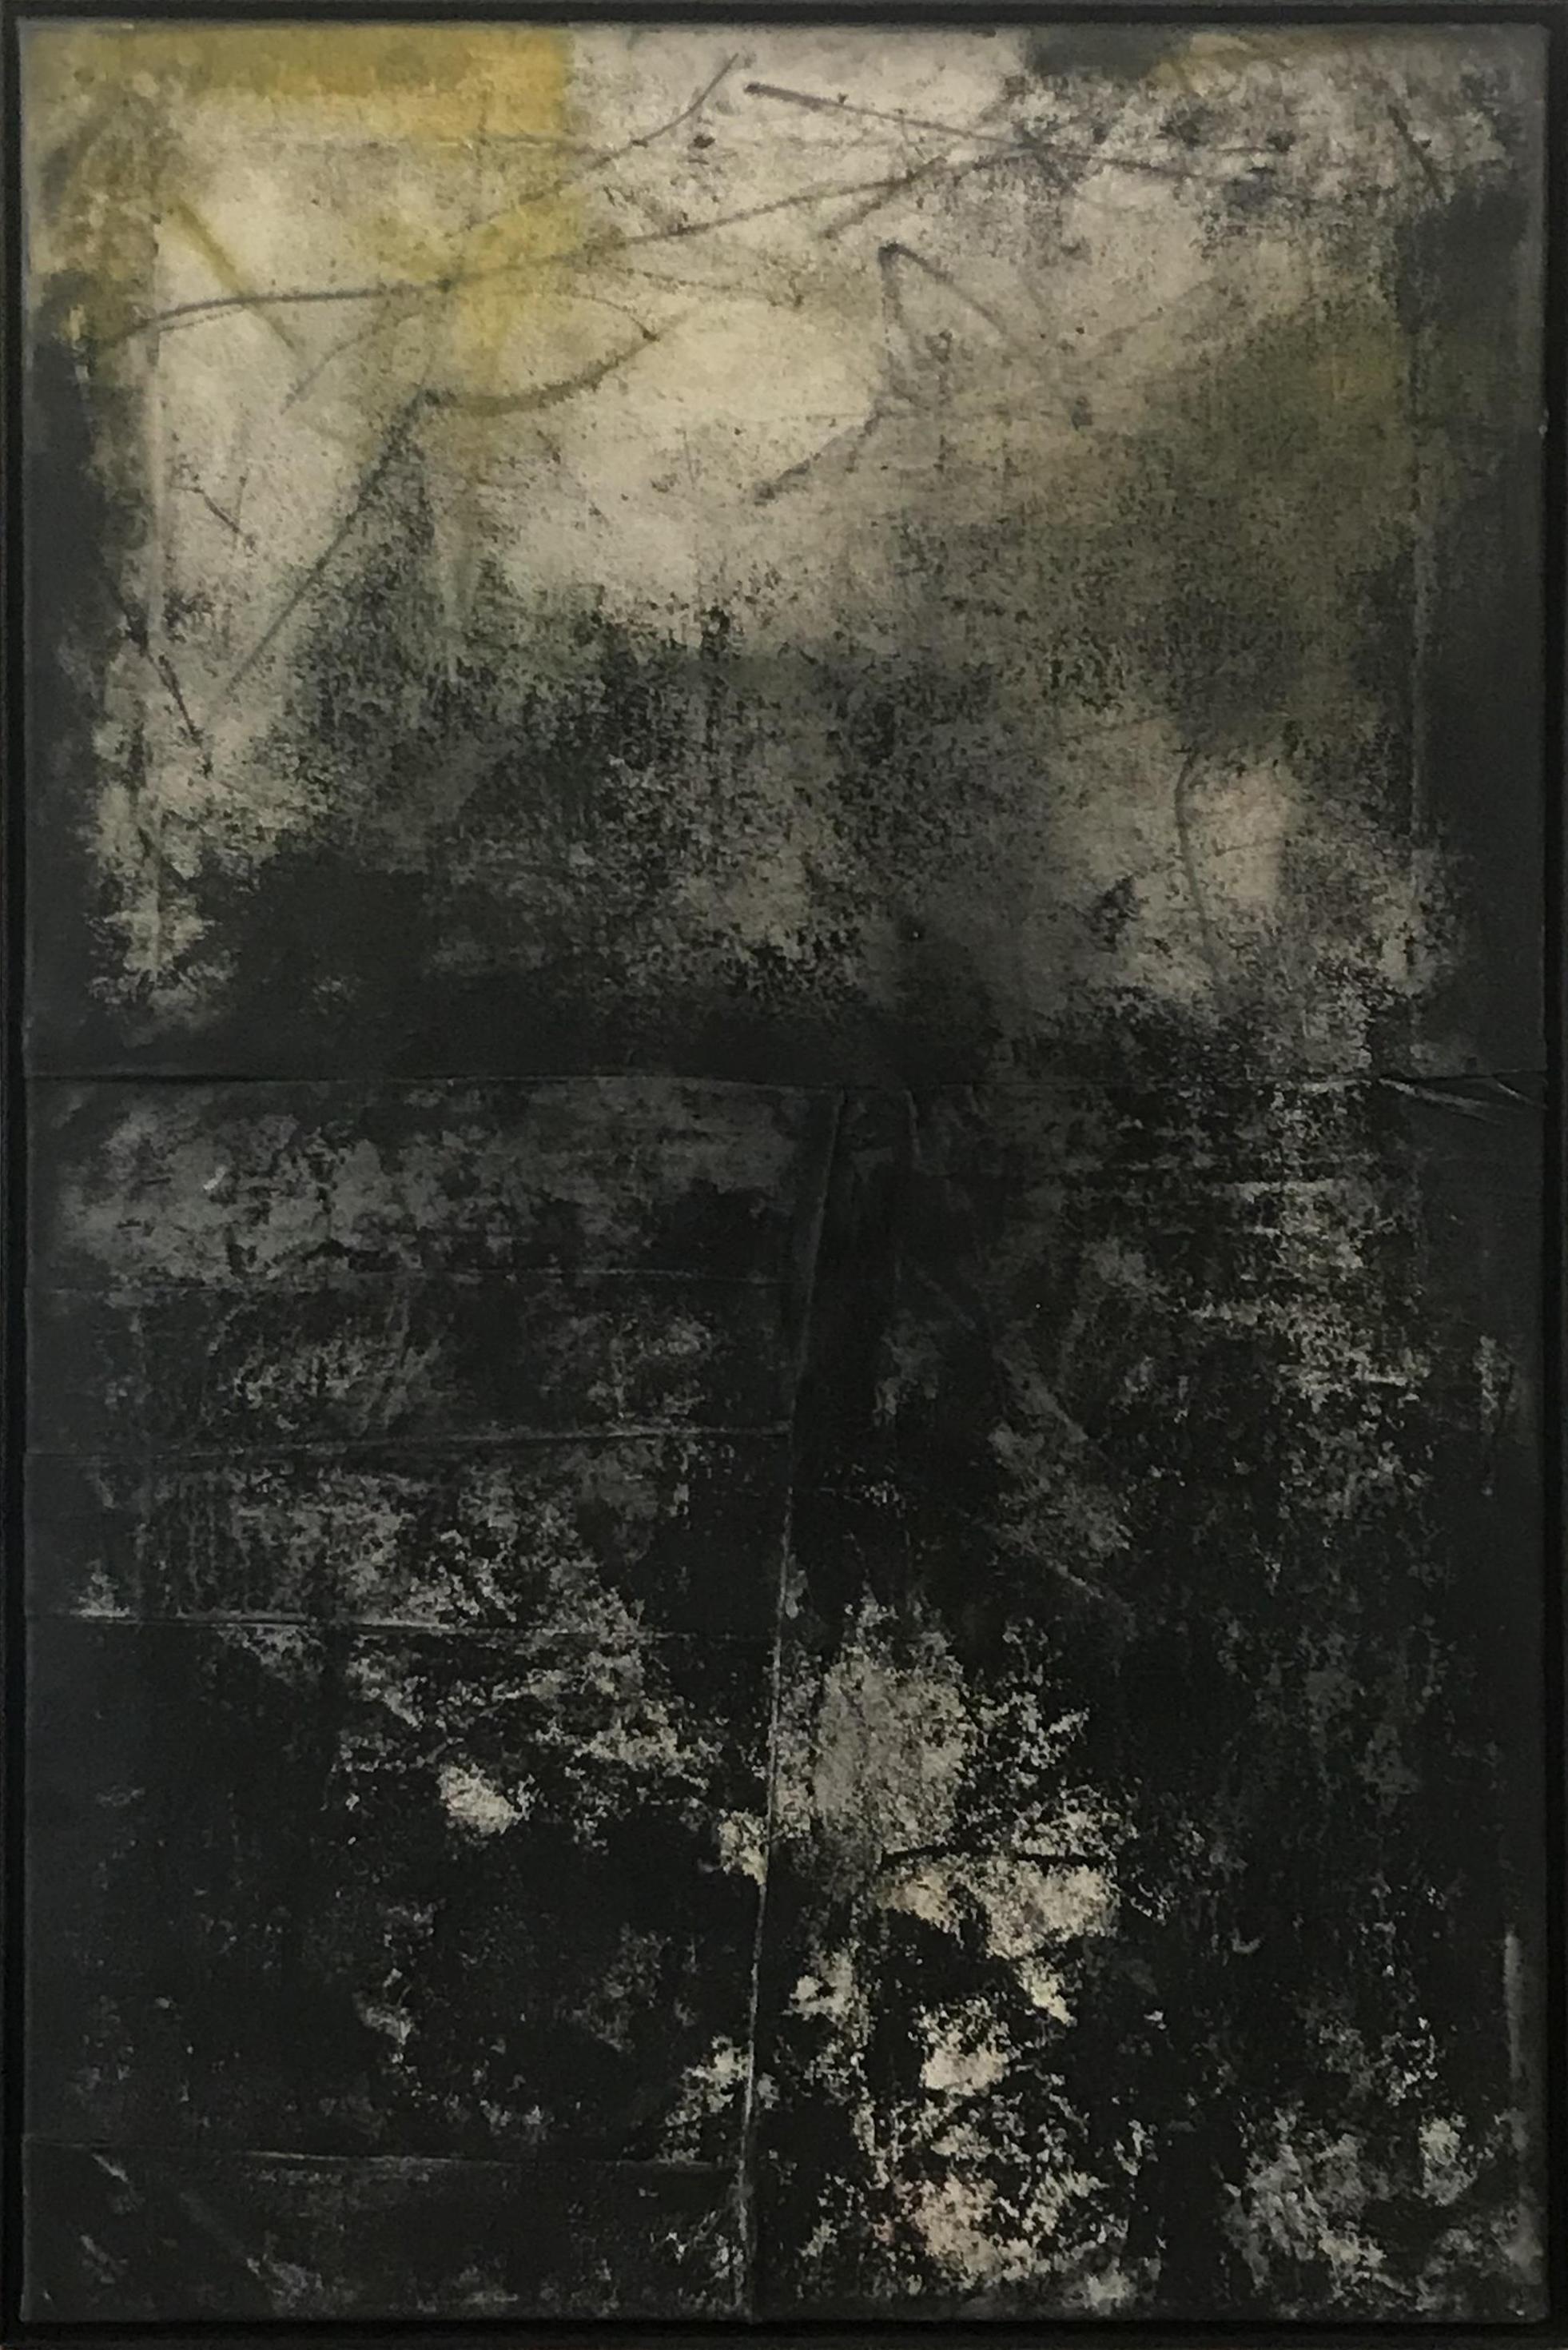 Ryan McGennisken, Smoke Alarm 78 x 122 cm, mixed media on canvas, available